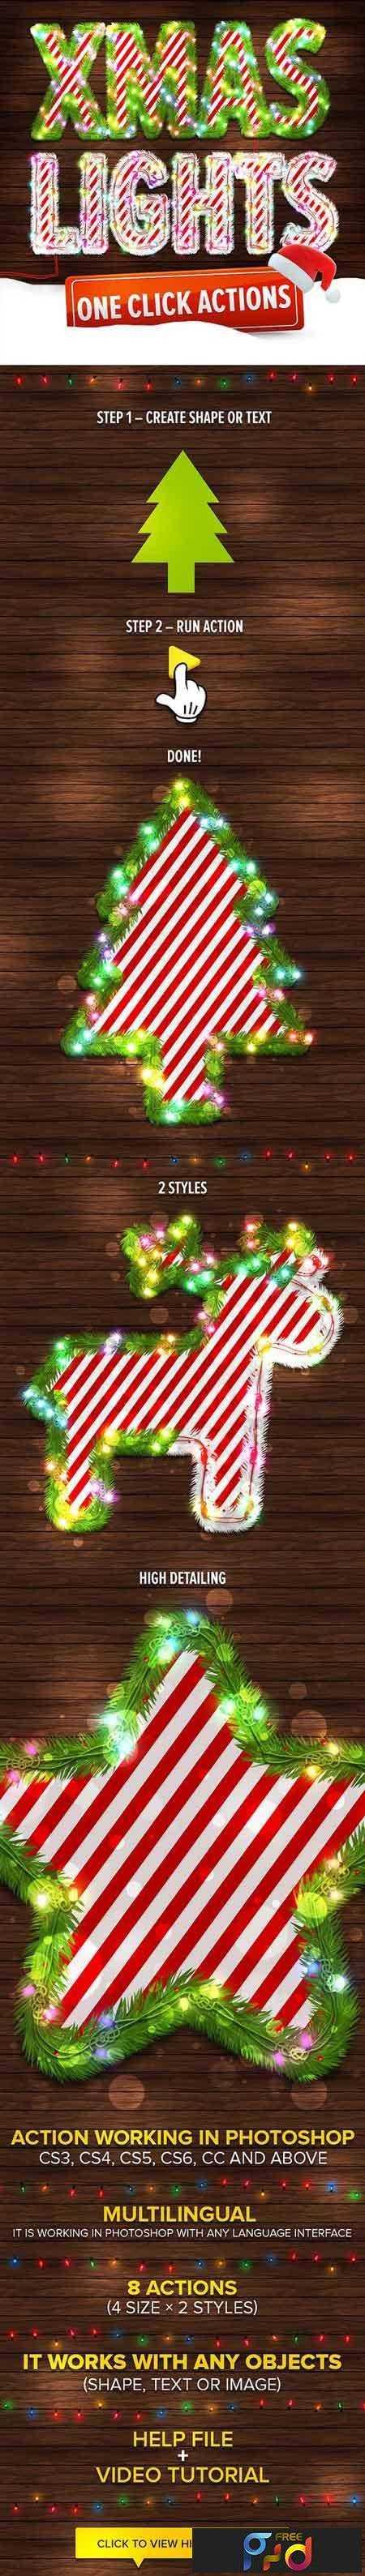 freepsdvn-com_1482219685_christmas-lights-photoshop-action-19135978